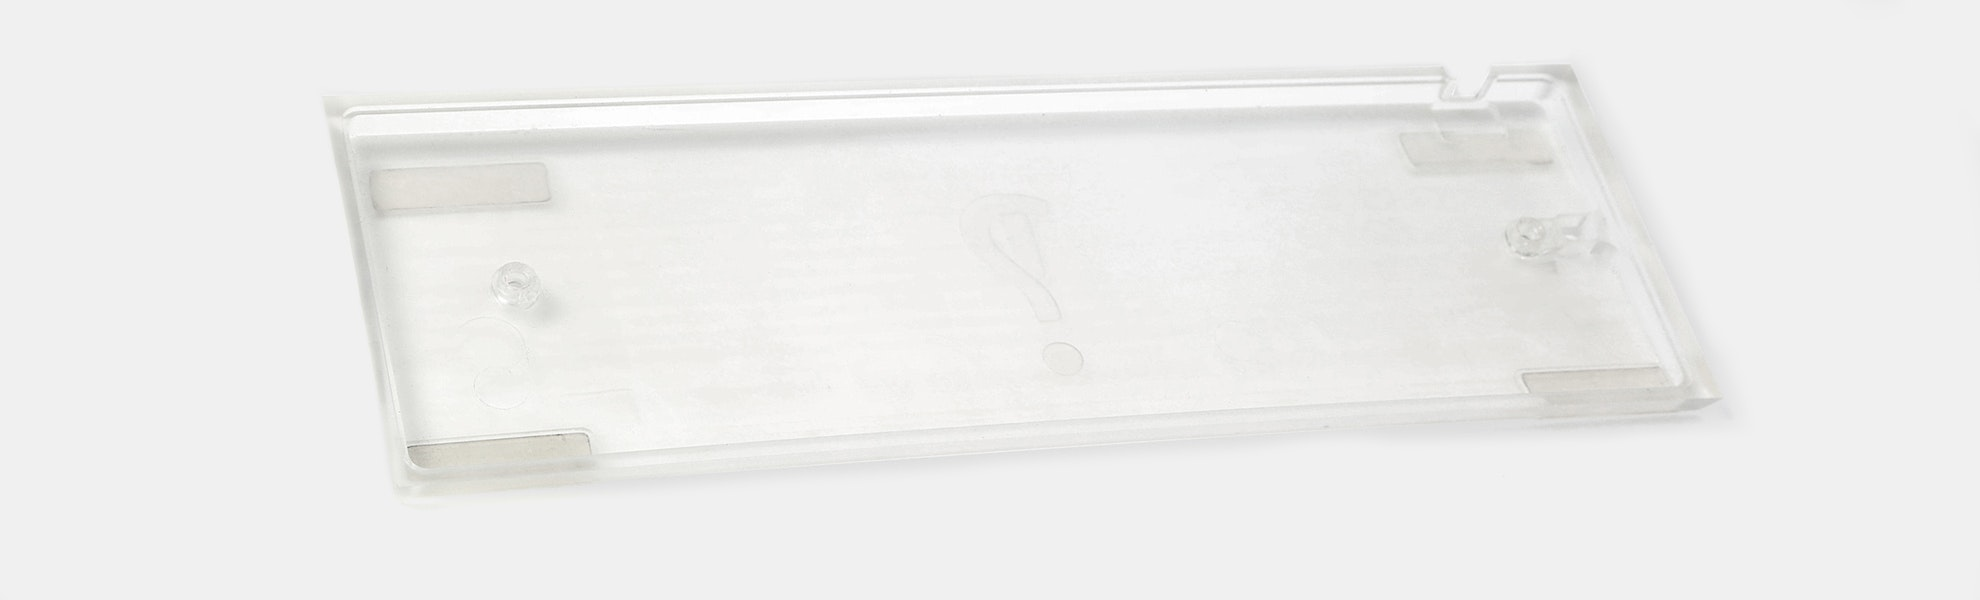 Clueboard Polycarb Translucent Keyboard Case